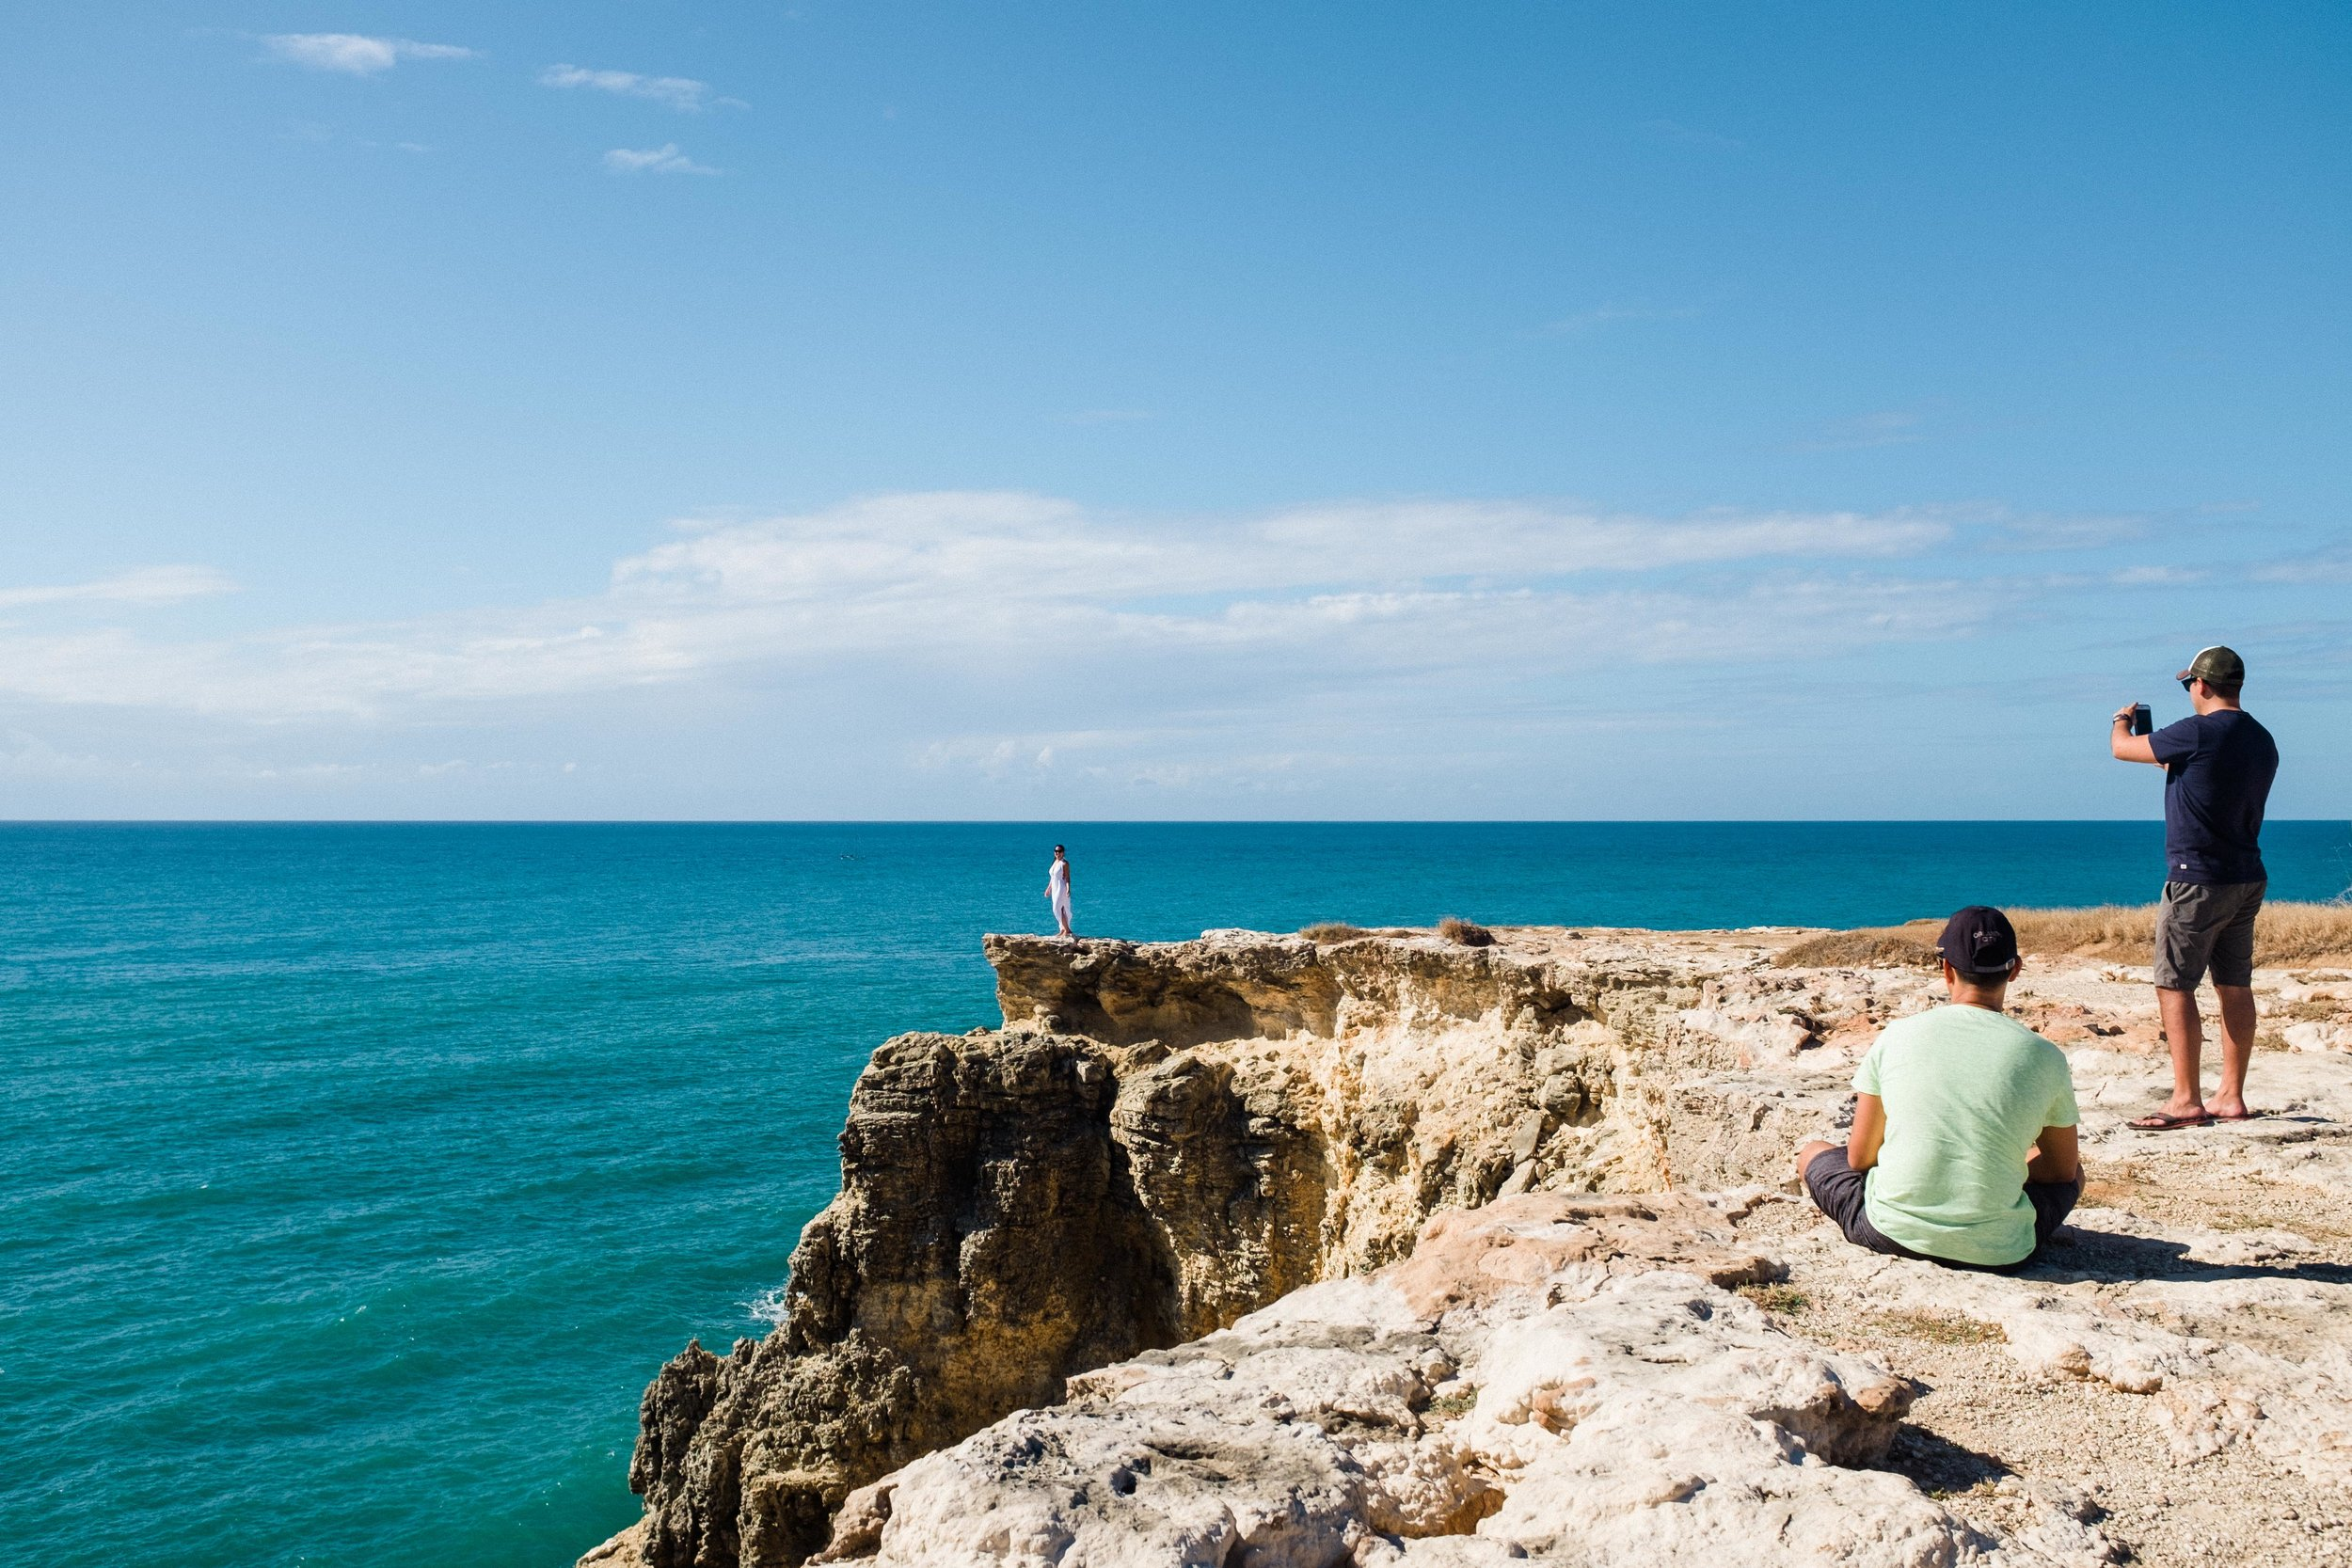 puerto-rico-cabo-rojo-el-faro-lighthouse-7041.jpg